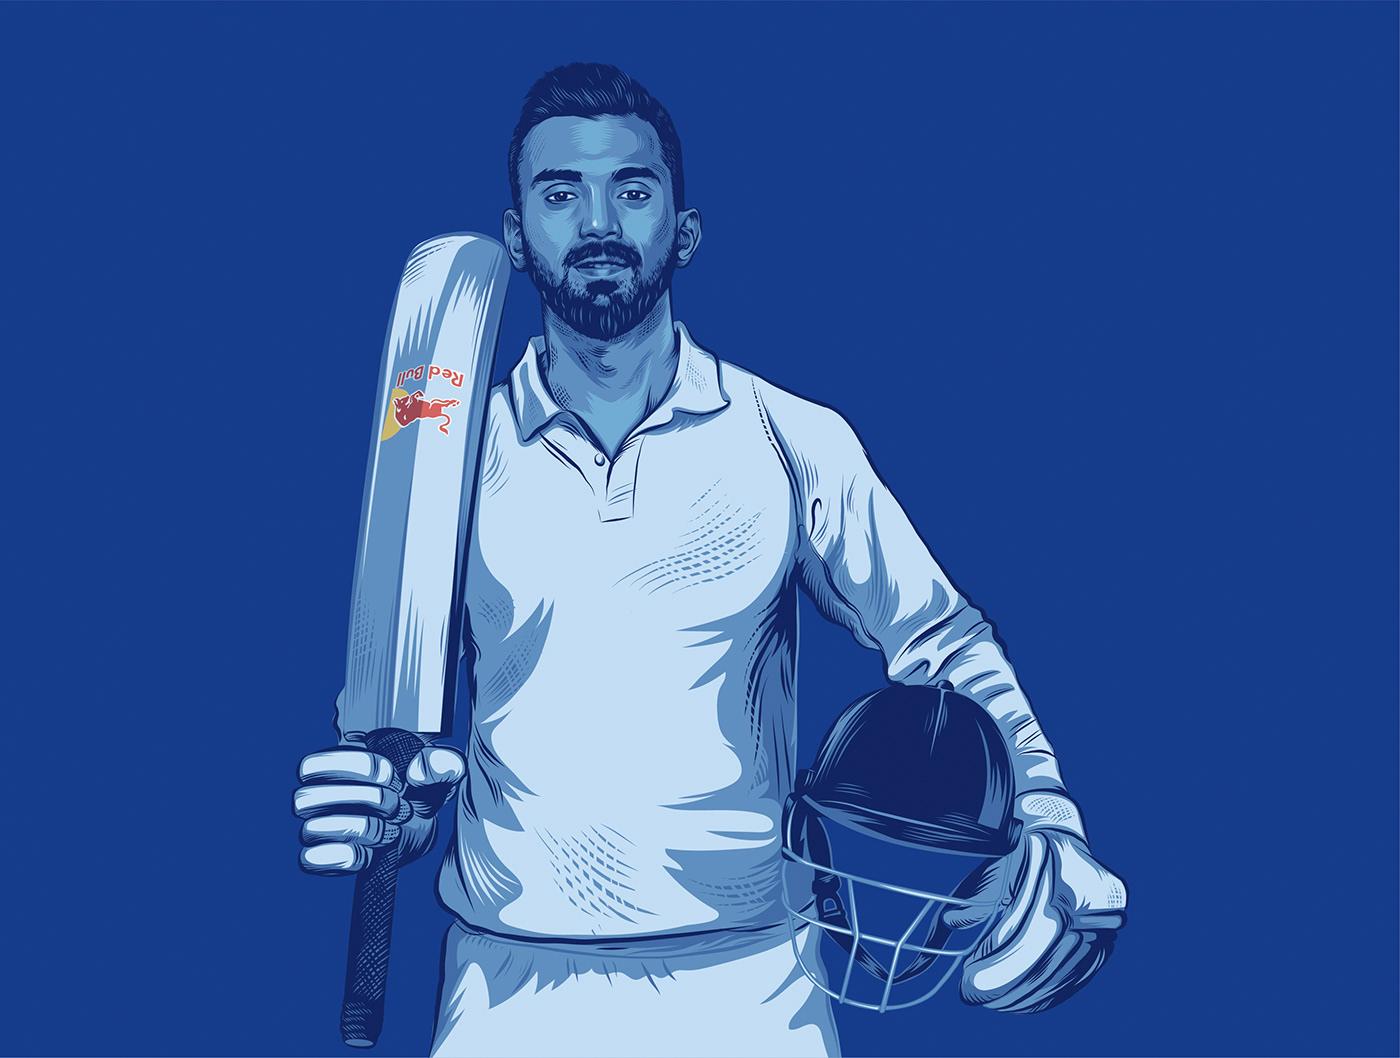 art Cricket Drawing  ILLUSTRATION  player portrait sport illustration